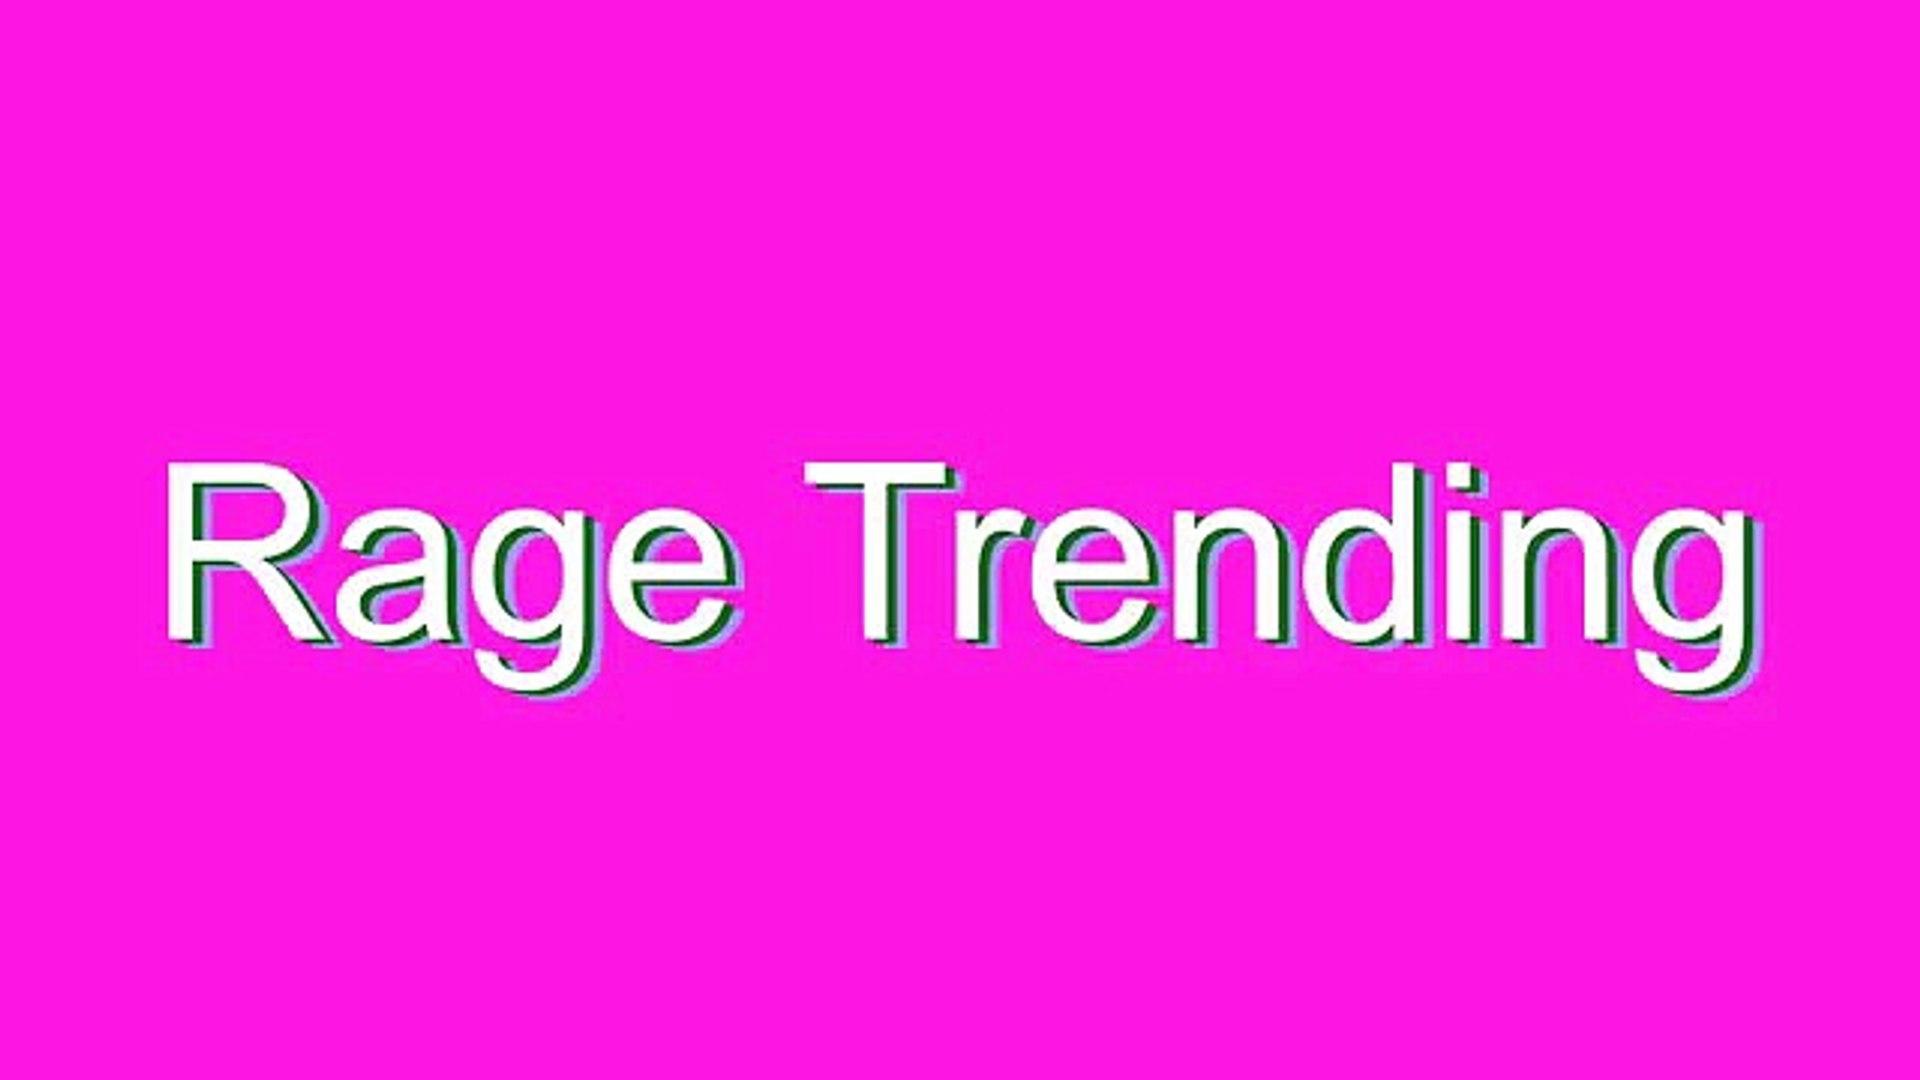 How to Pronounce Rage Trending